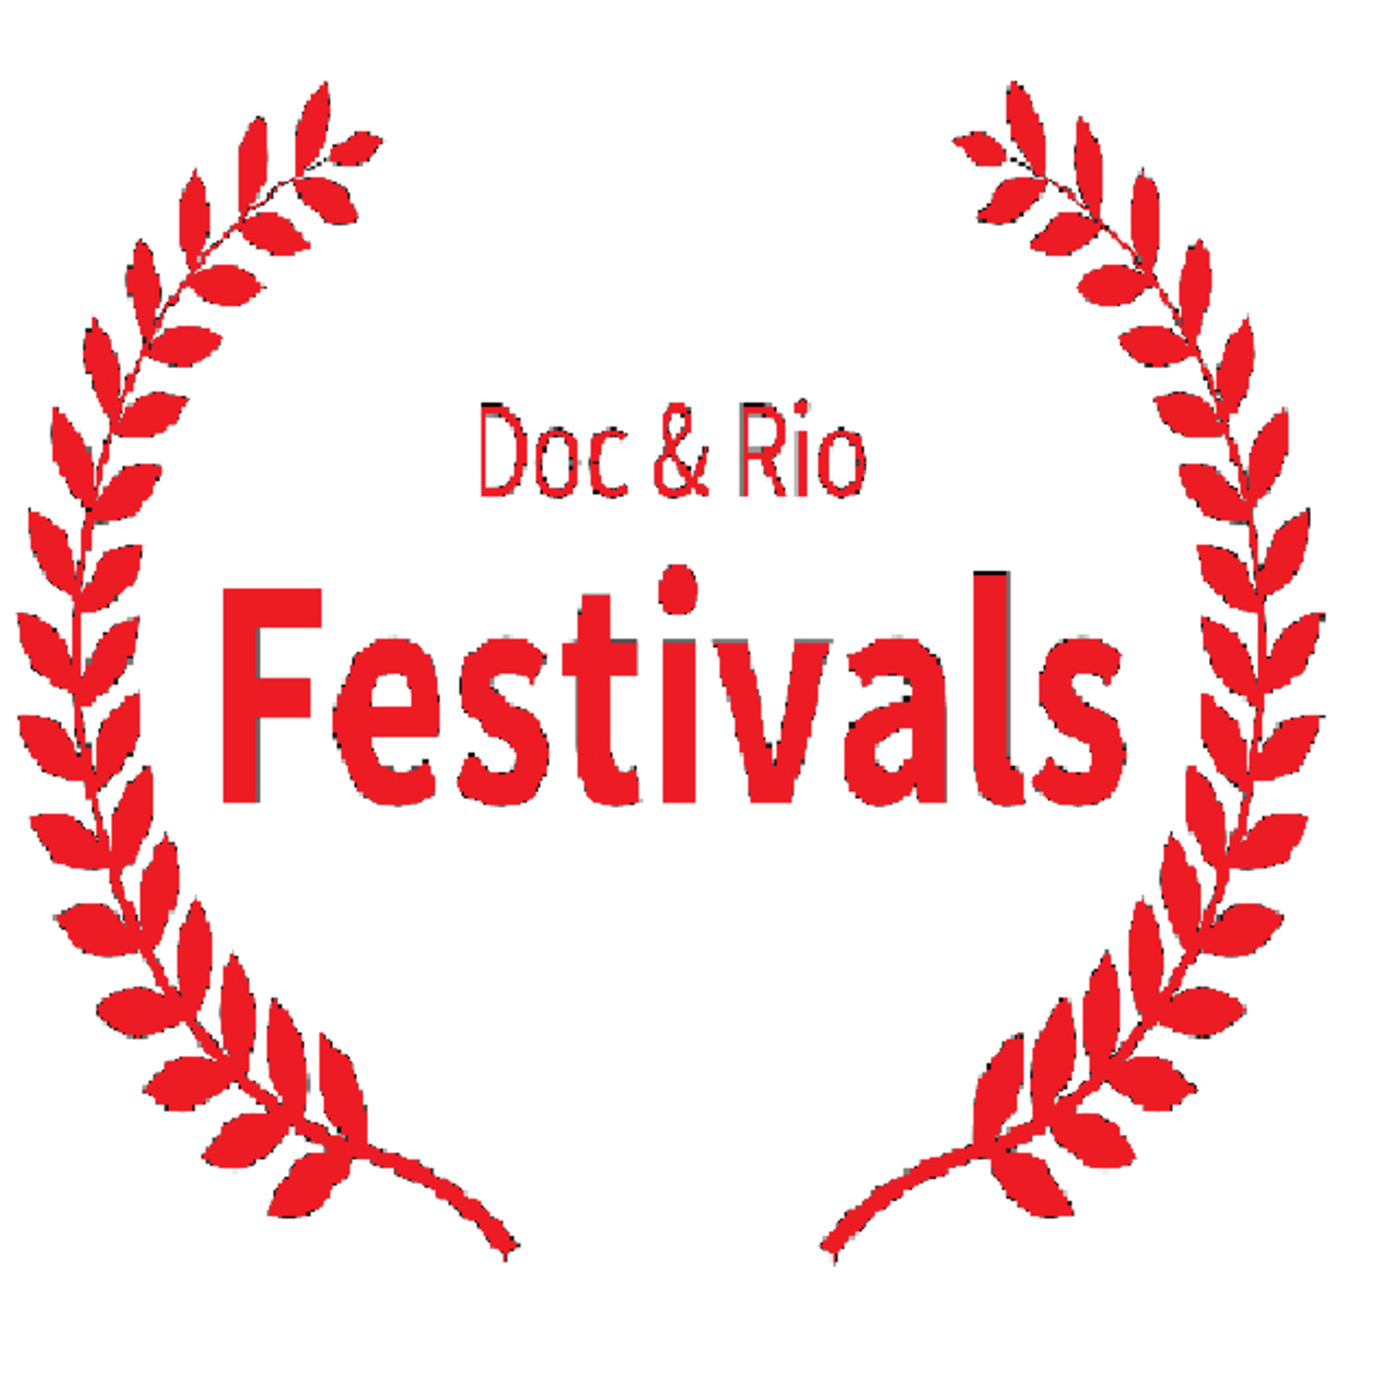 Doc & Rio Festivals